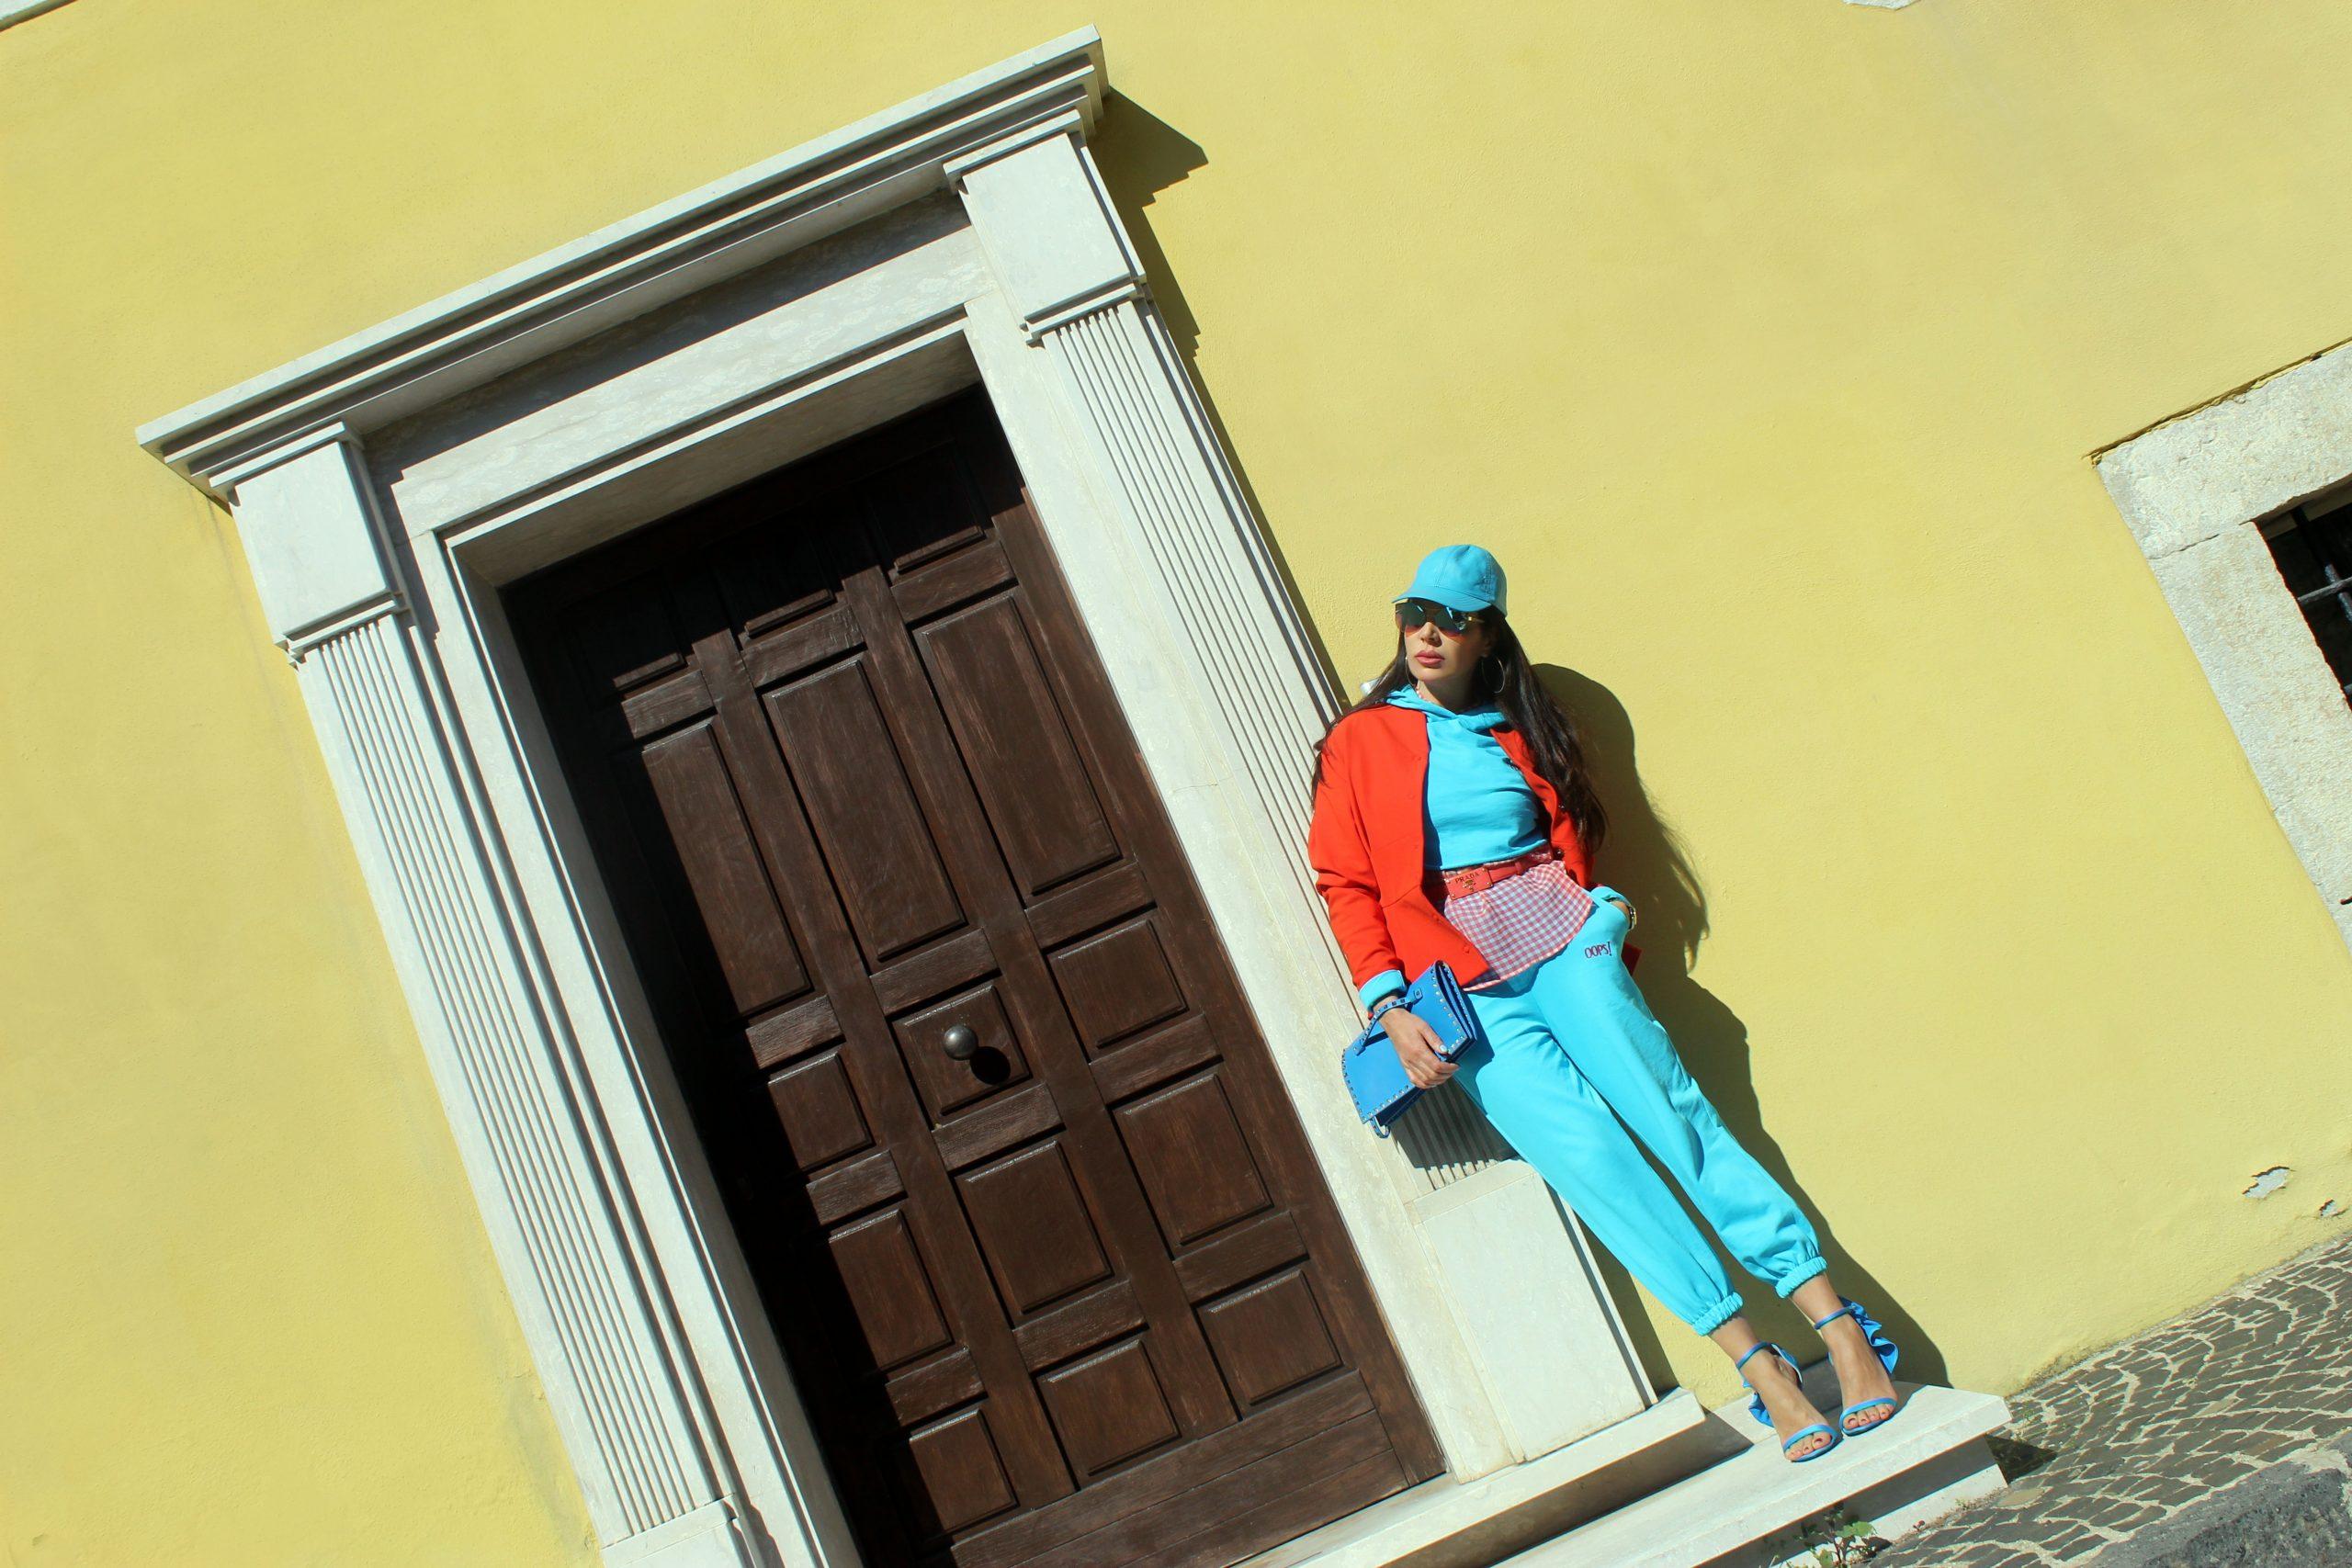 Prada Vivid Colour Outfit Turquoise and Orange Spring Trend 2021